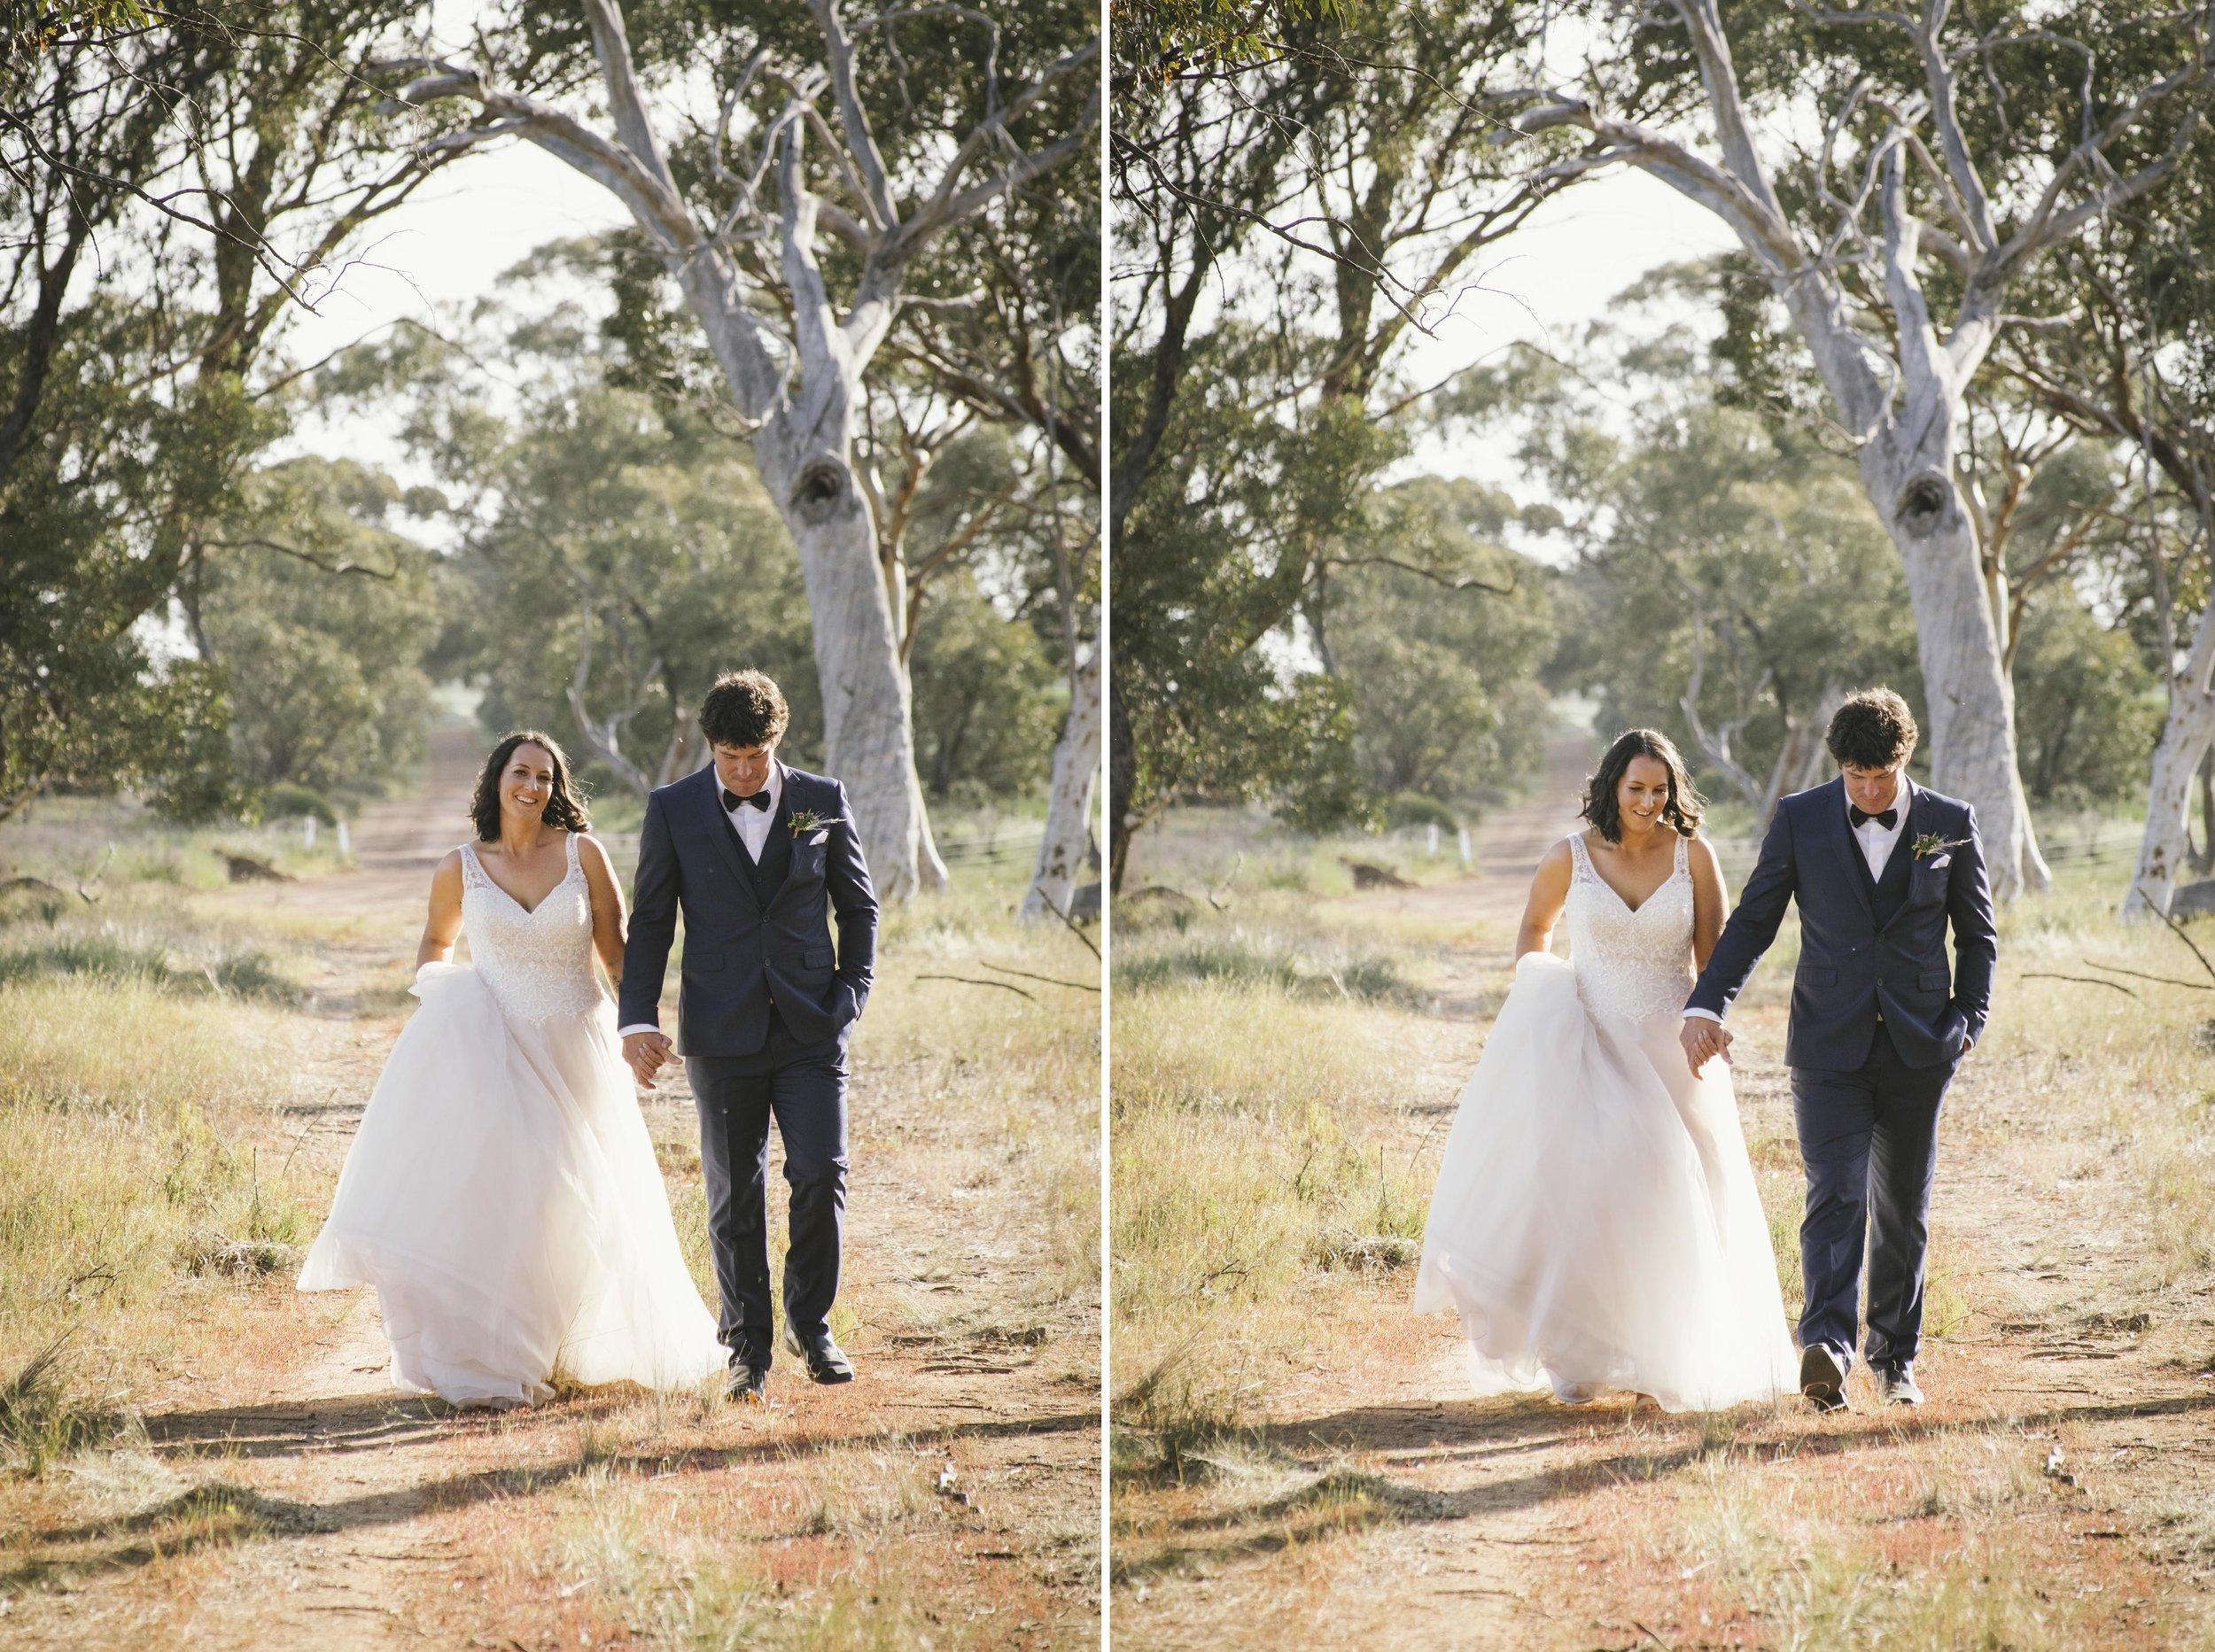 Angie Roe Photography Wheatbelt Avon Valley Farm Wedding (36and37).jpg